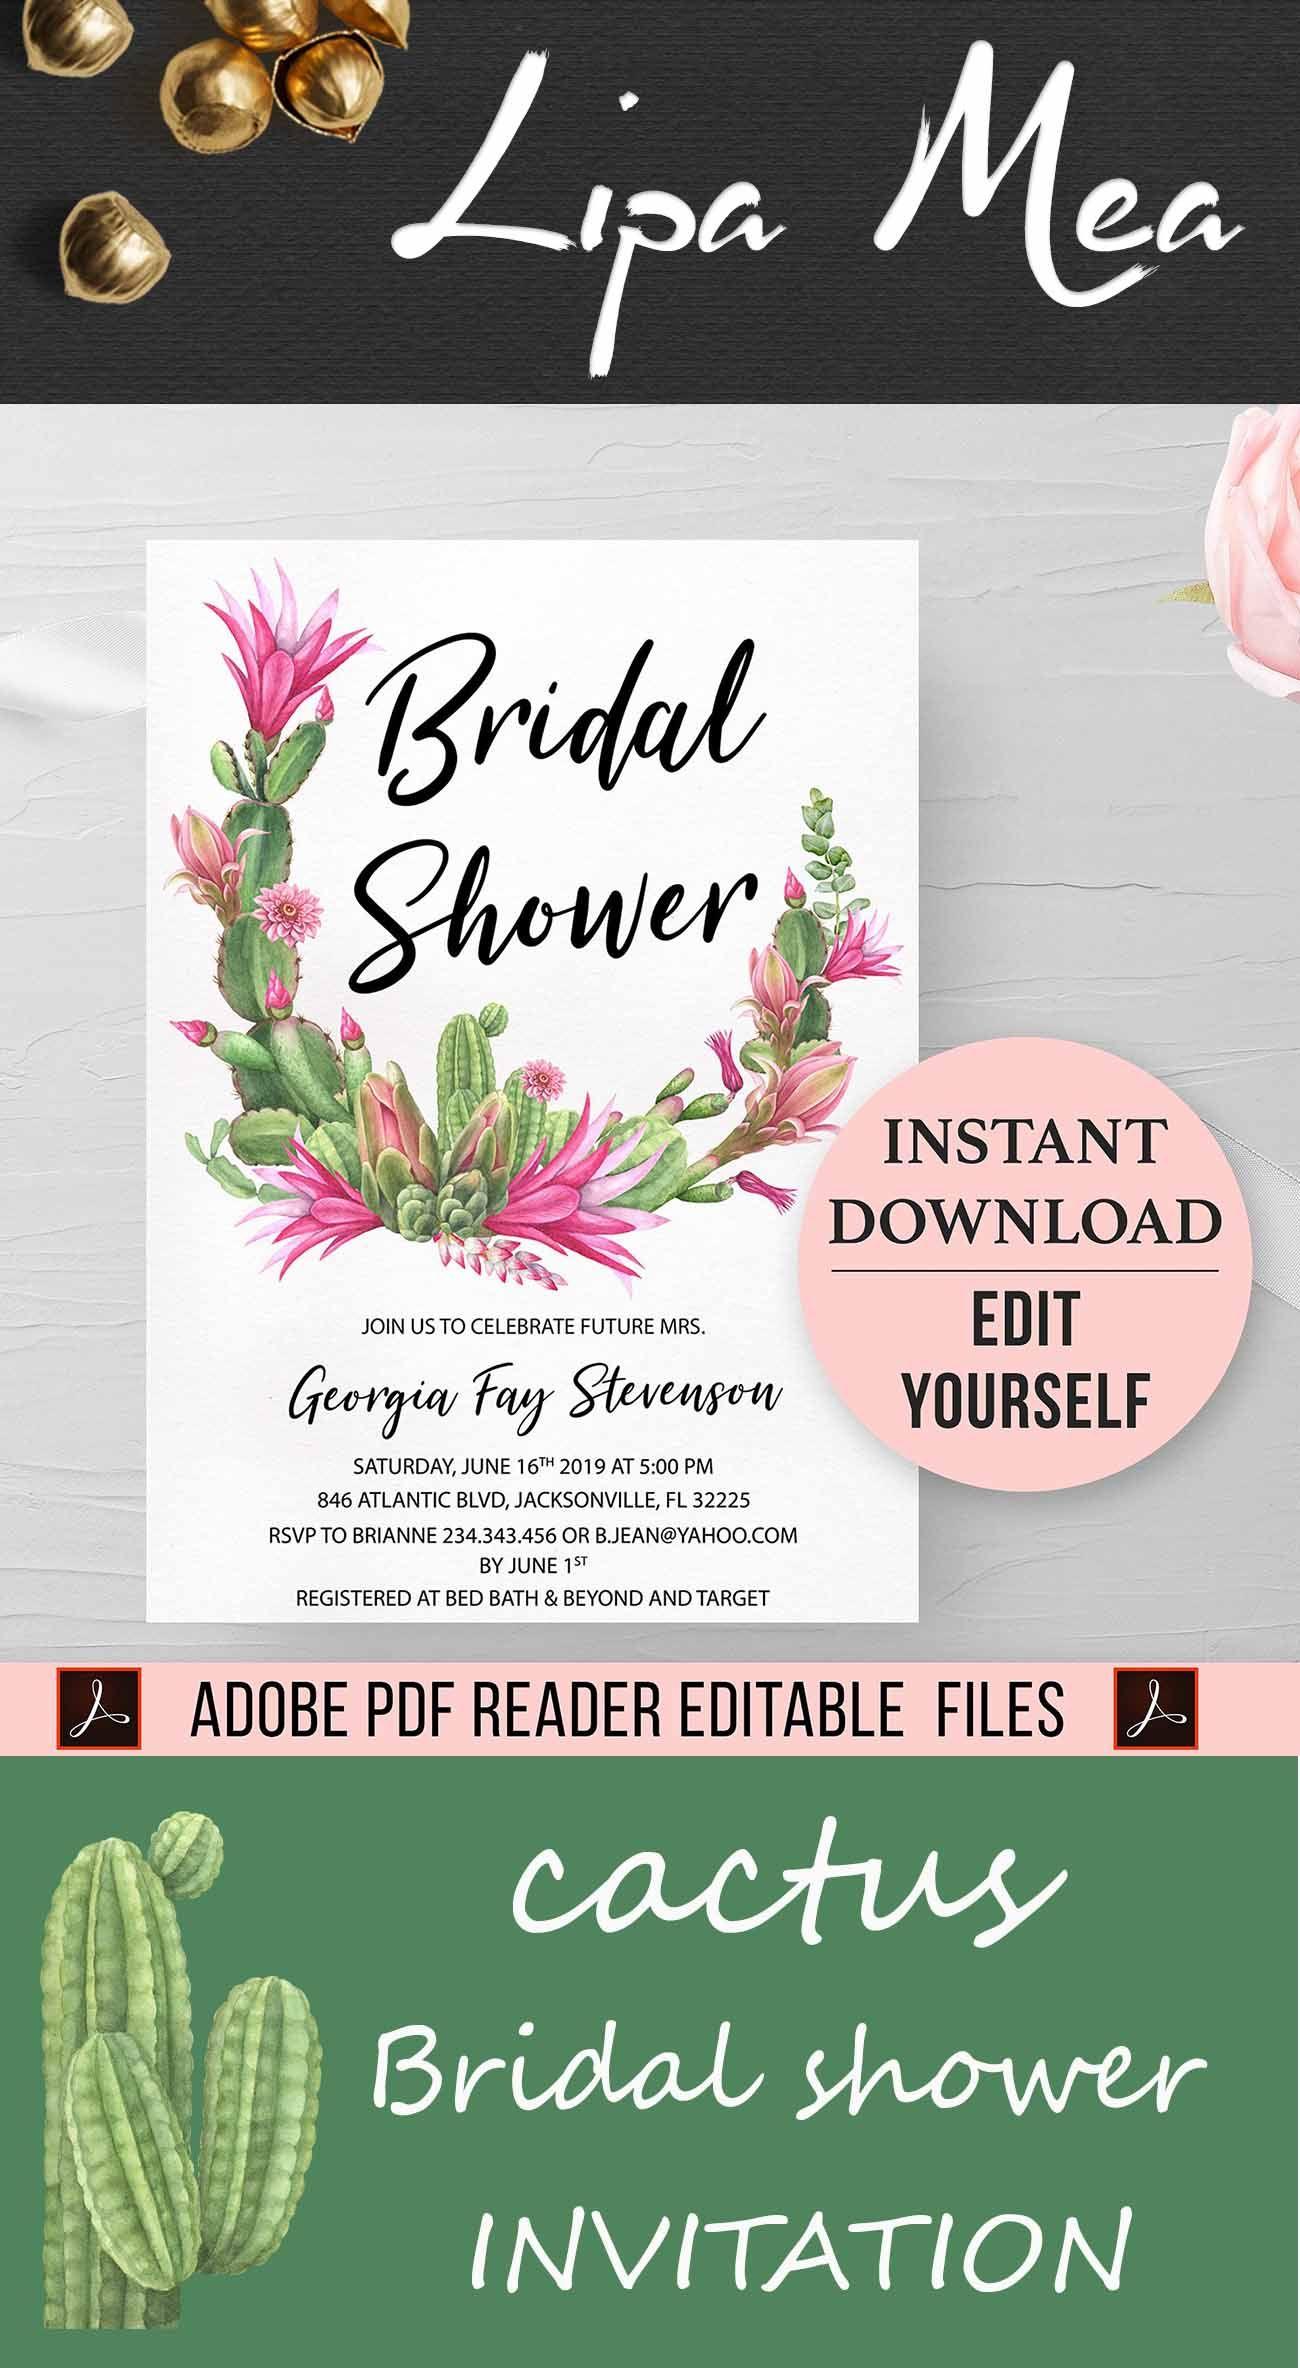 90d39abbd34 Floral Cactus bridal shower invitation template Instant Download Editable  Fiesta bridal shower invite